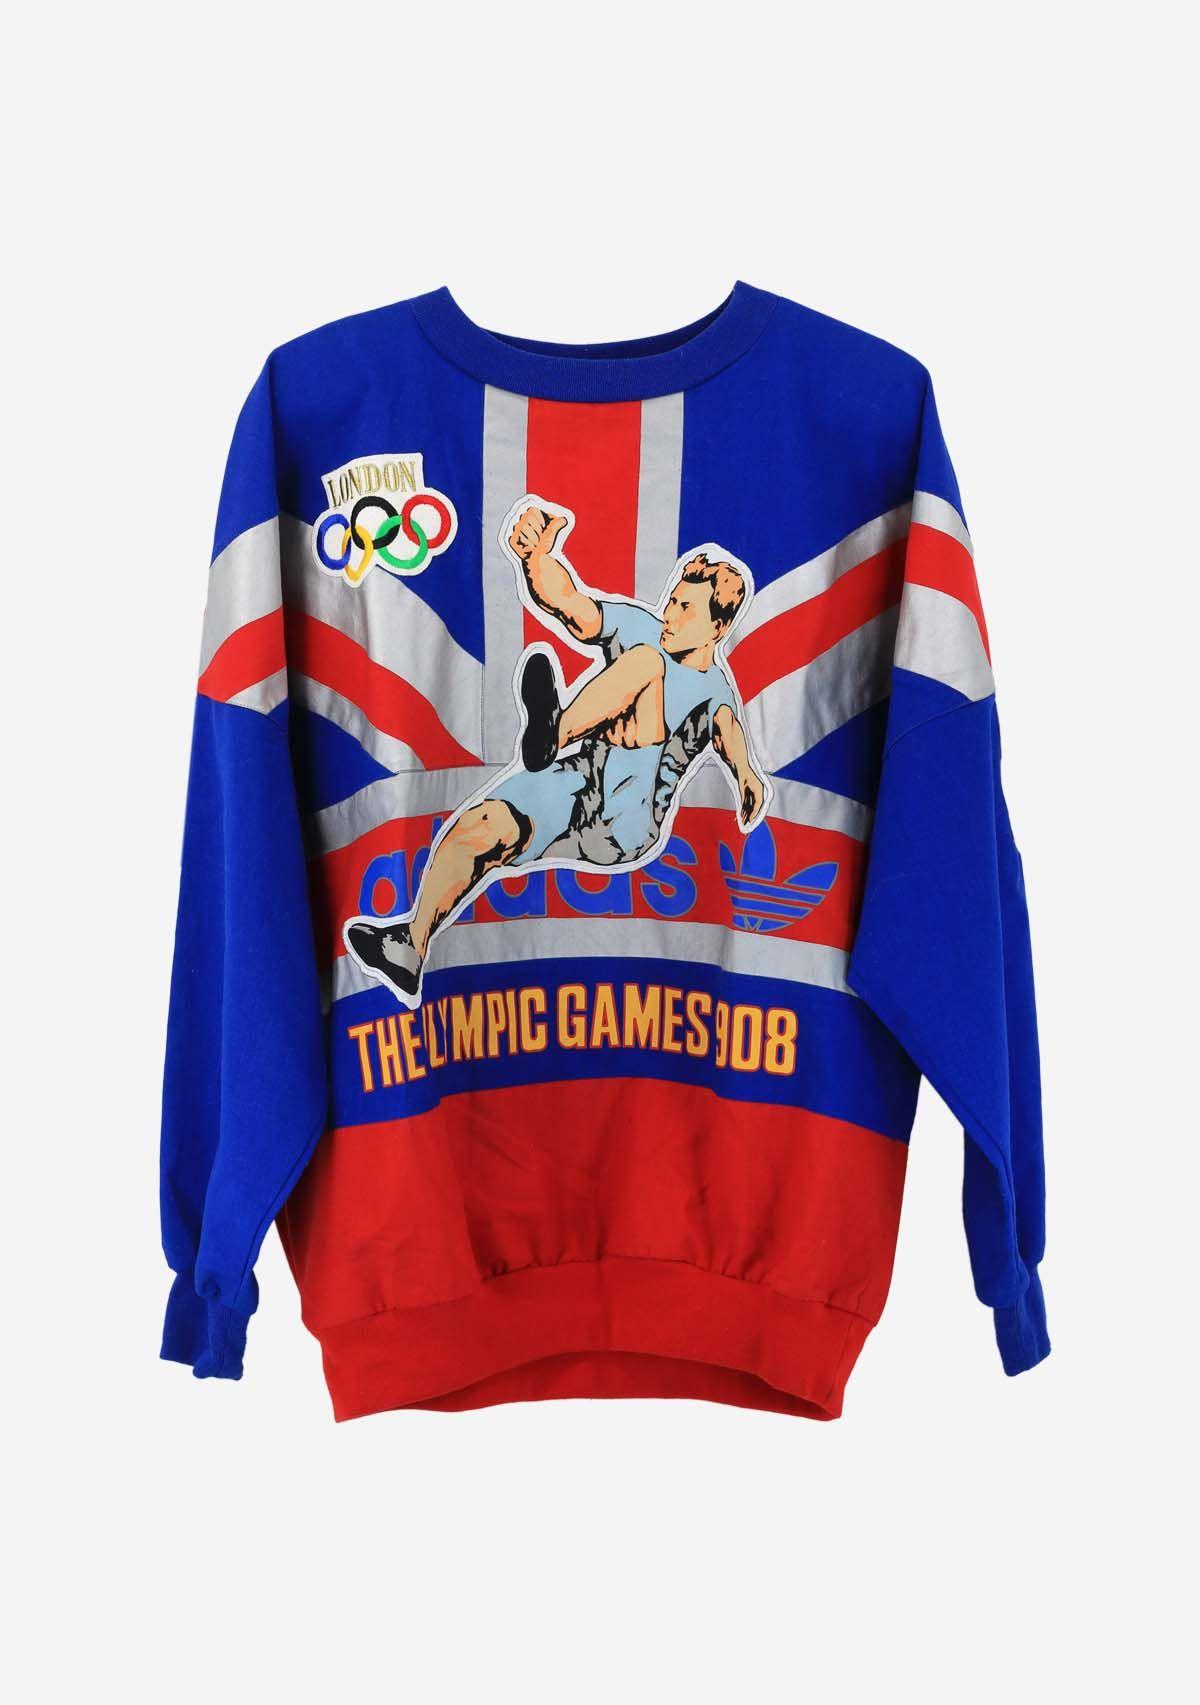 Adidas London Olympics sweatshirt | Sweatshirts, Retro